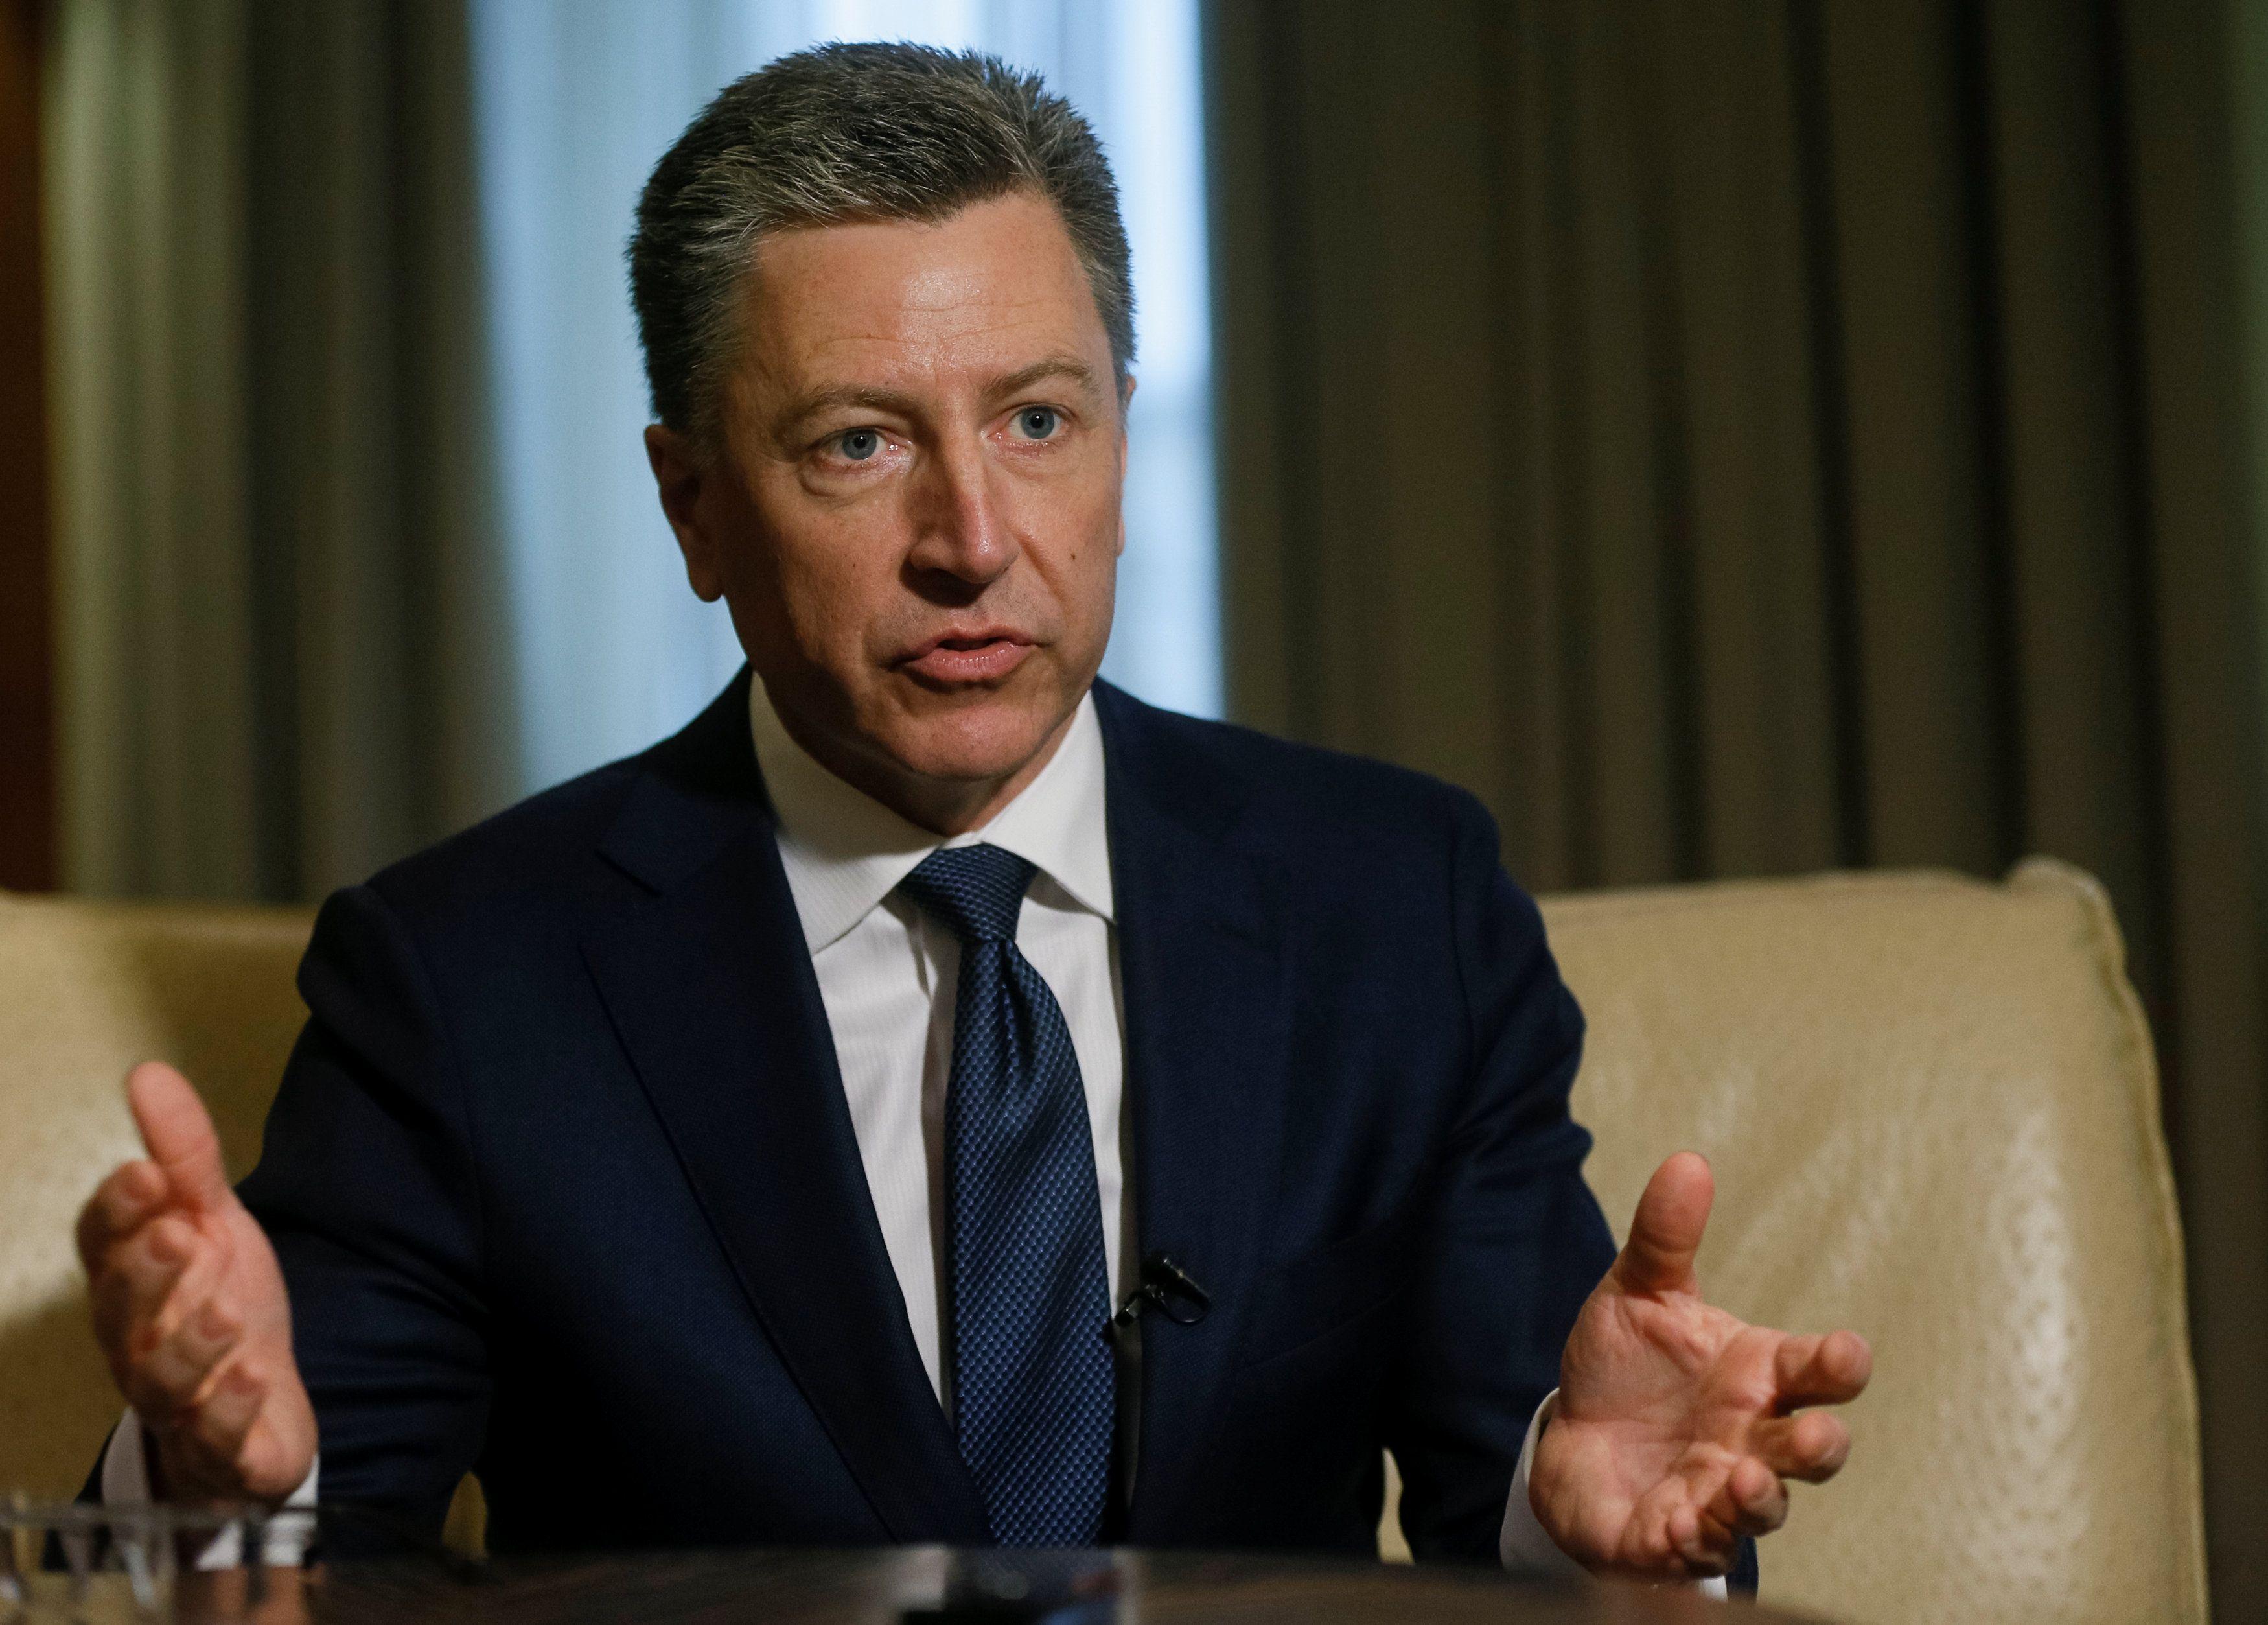 На Донбассе ухудшается ситуация, отметил Курт Волкер